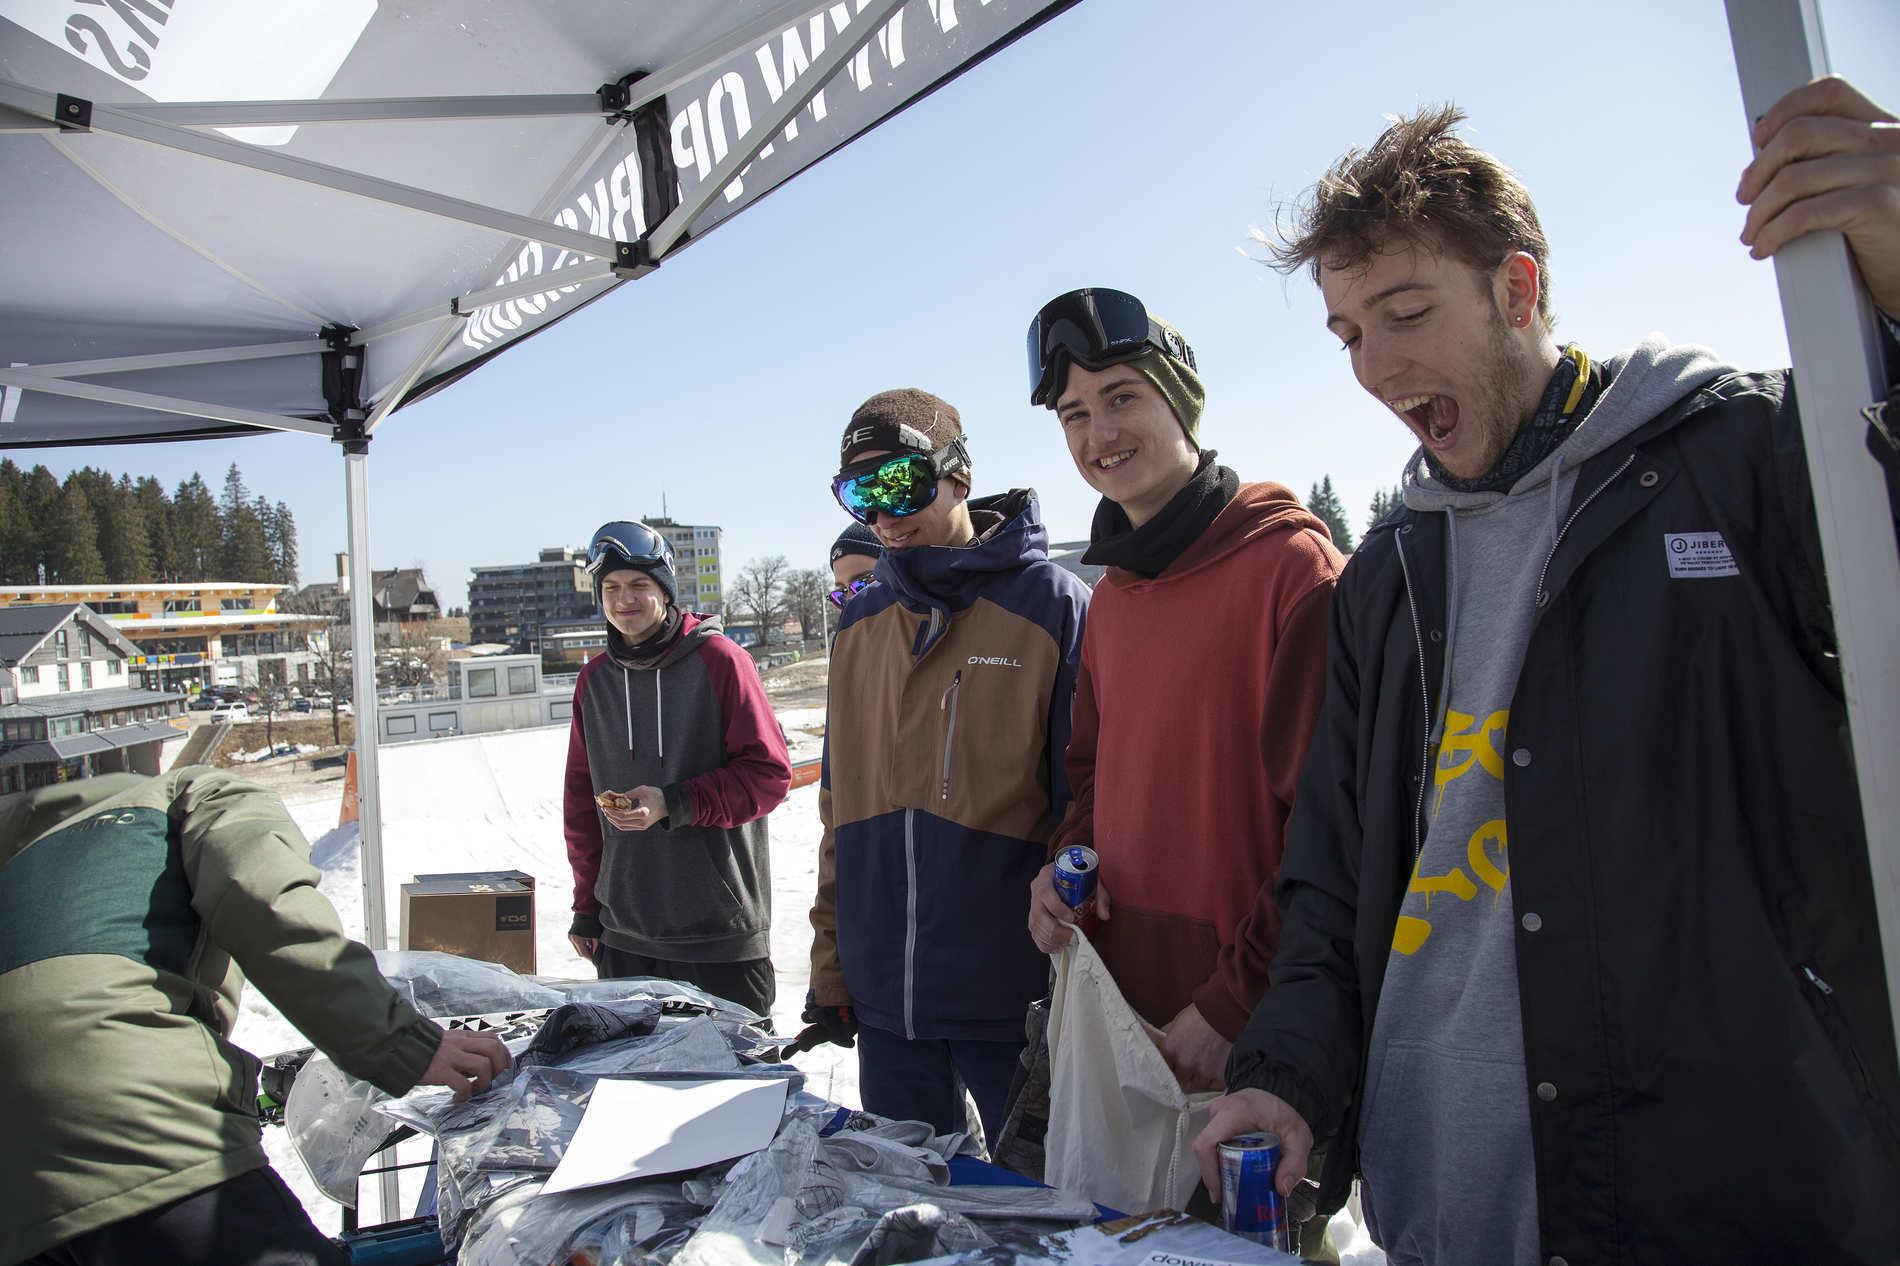 web snowpark feldberg 25 03 2017 lifestyle fs sb martin herrmann qparks 45